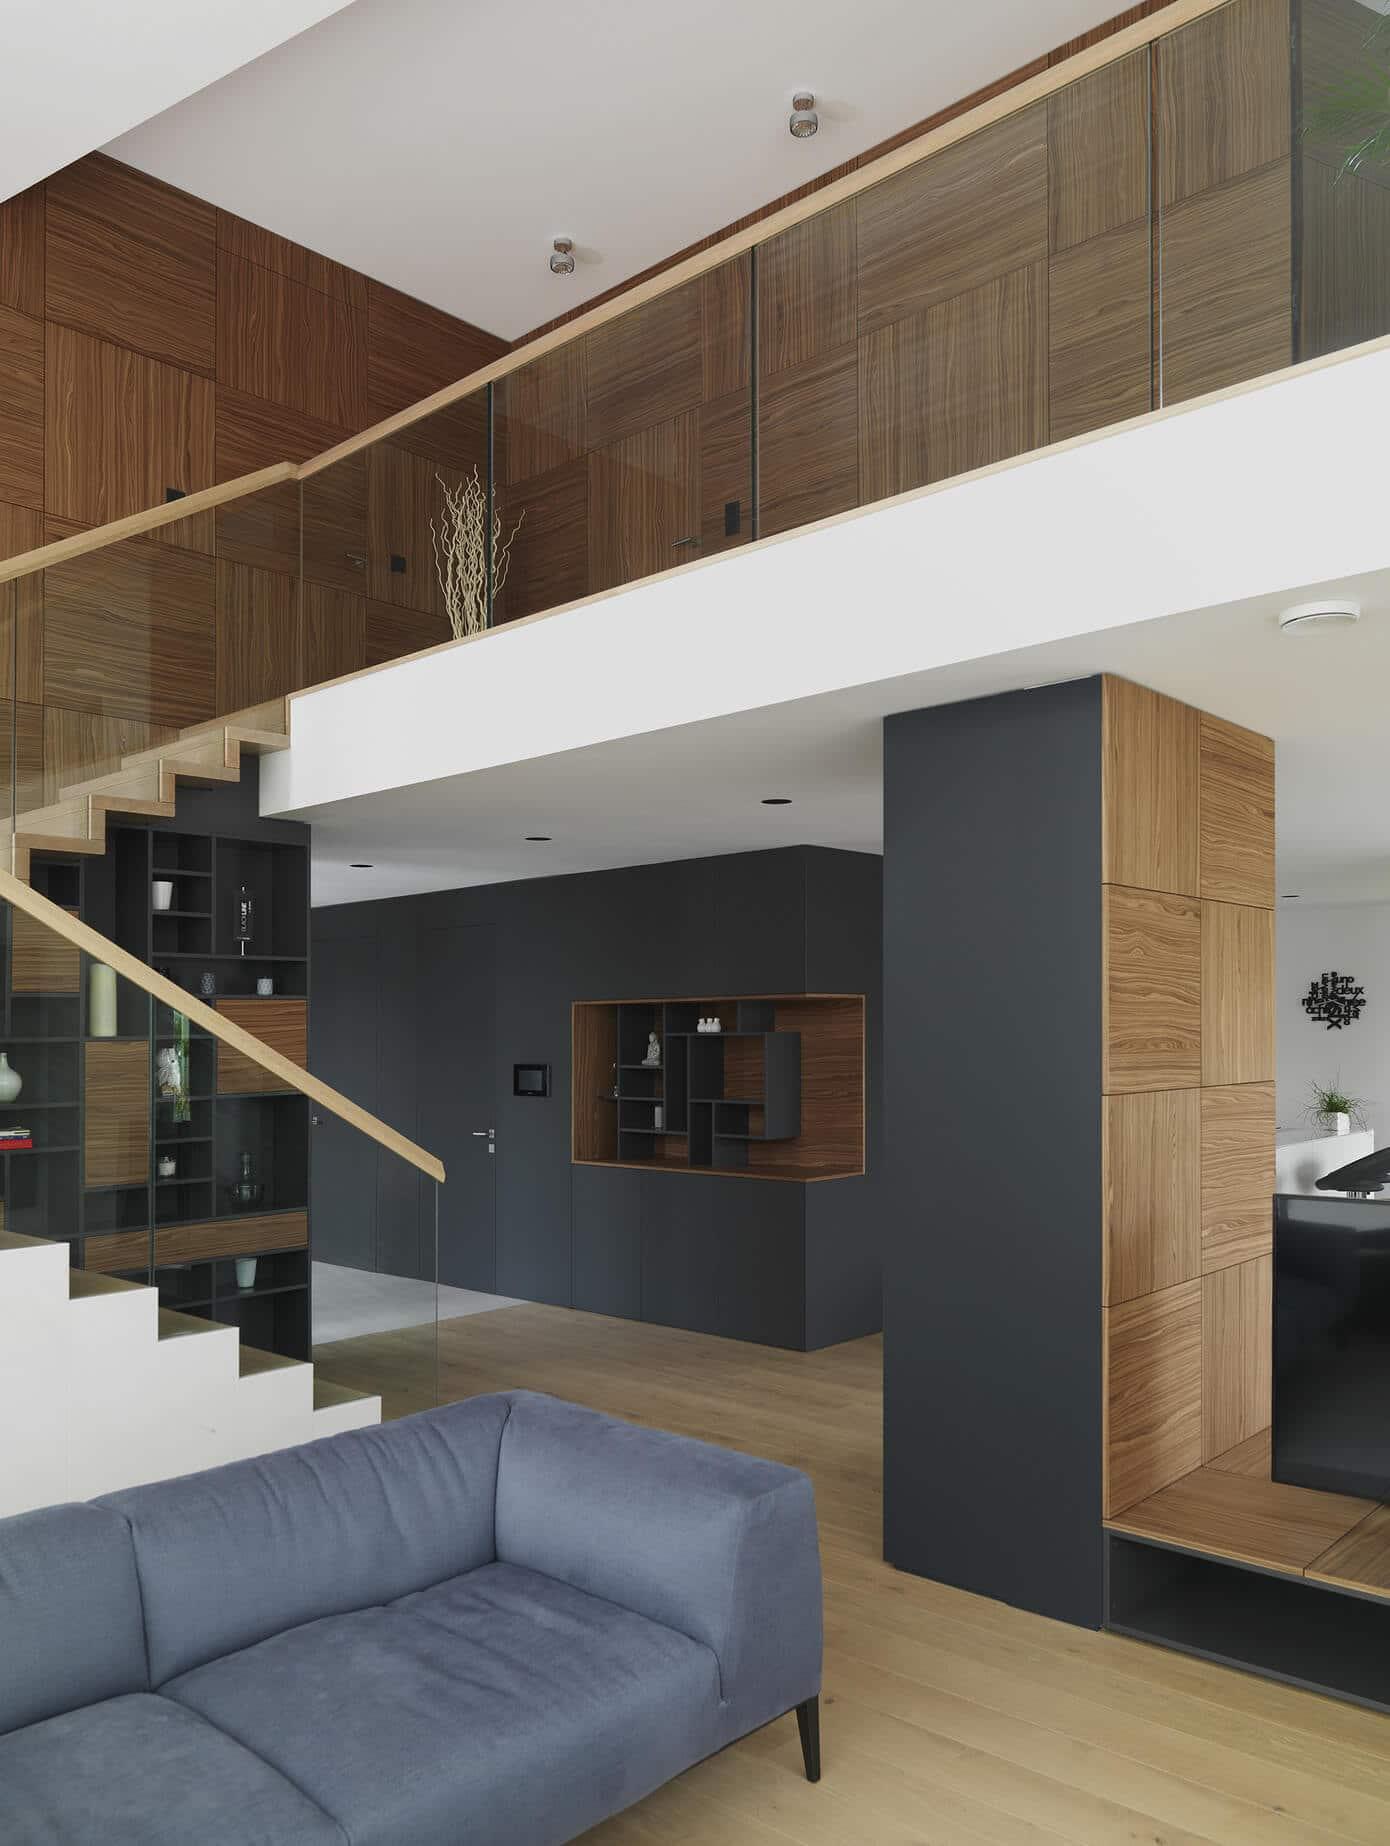 Planos de casa de dos plantas moderna for Diseno de la casa interior